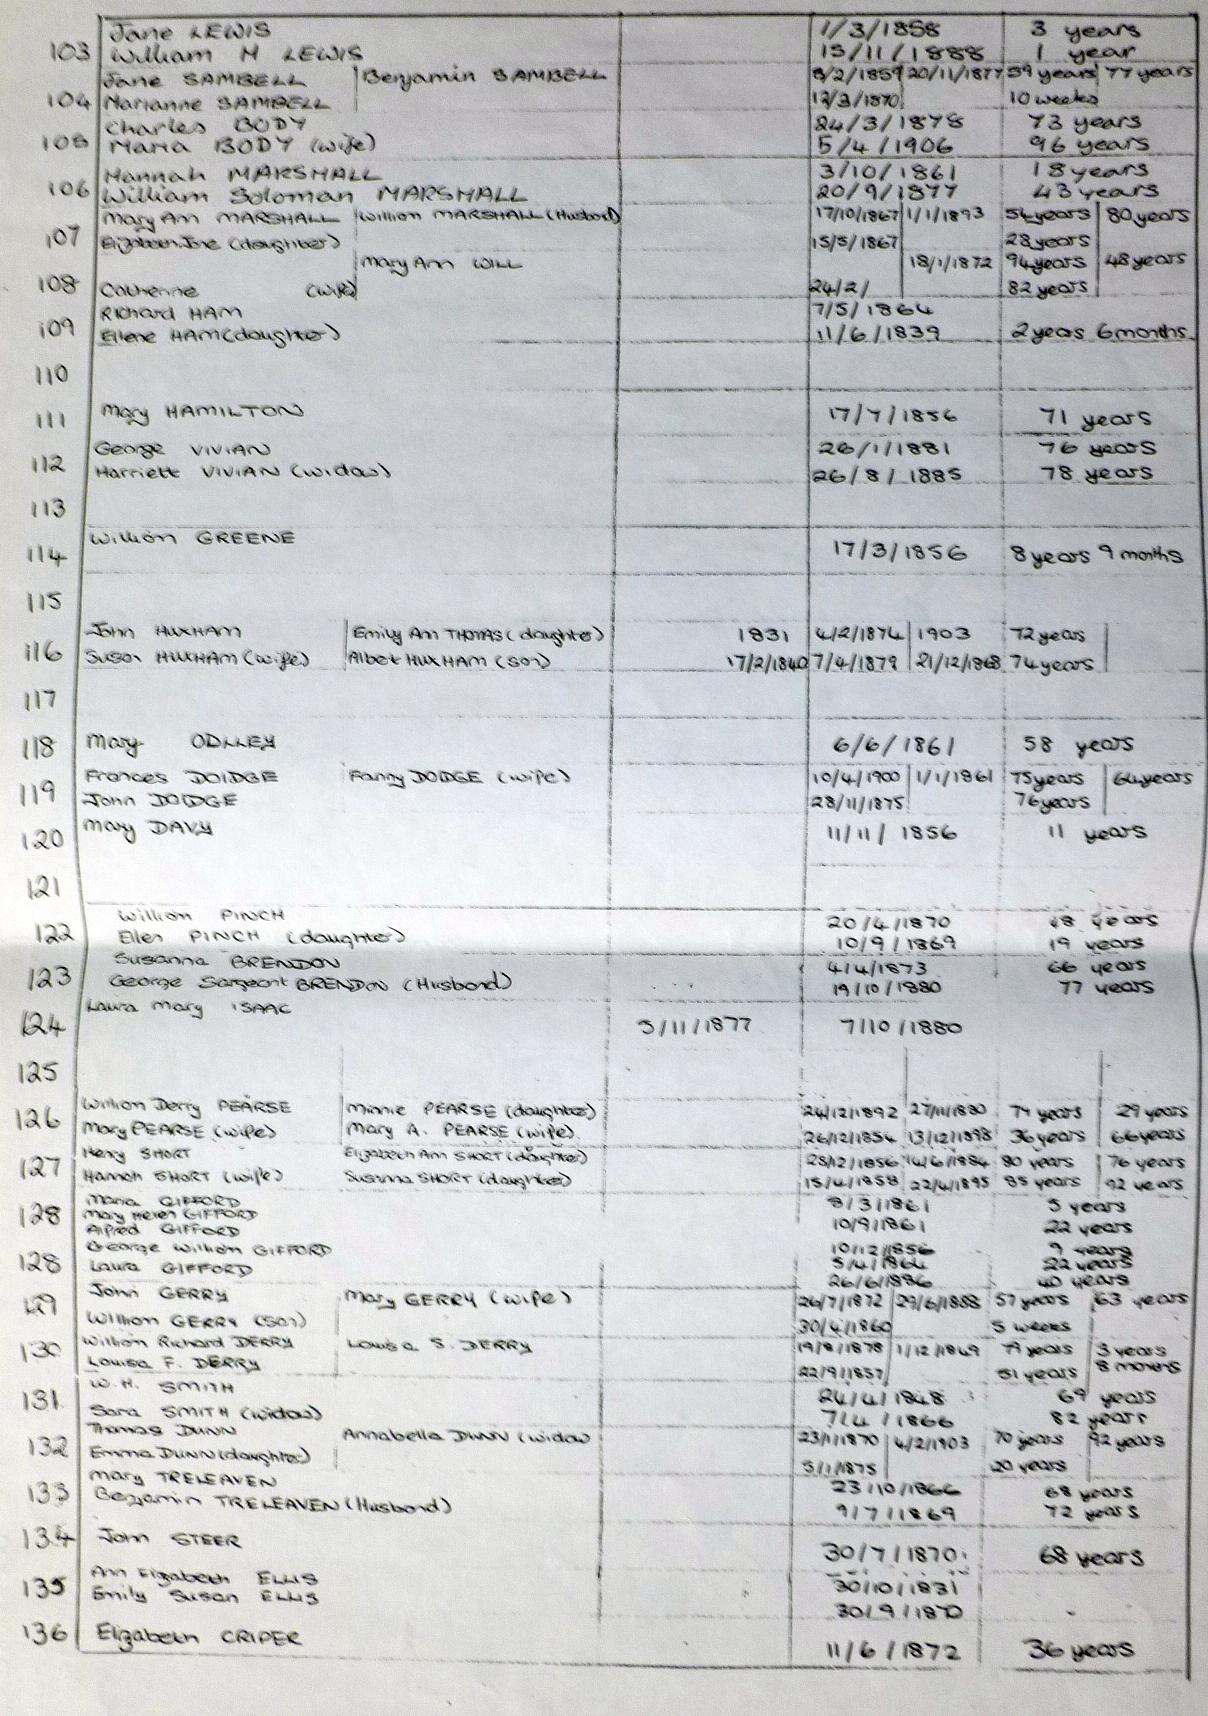 Bowling Green Cemetery Plan